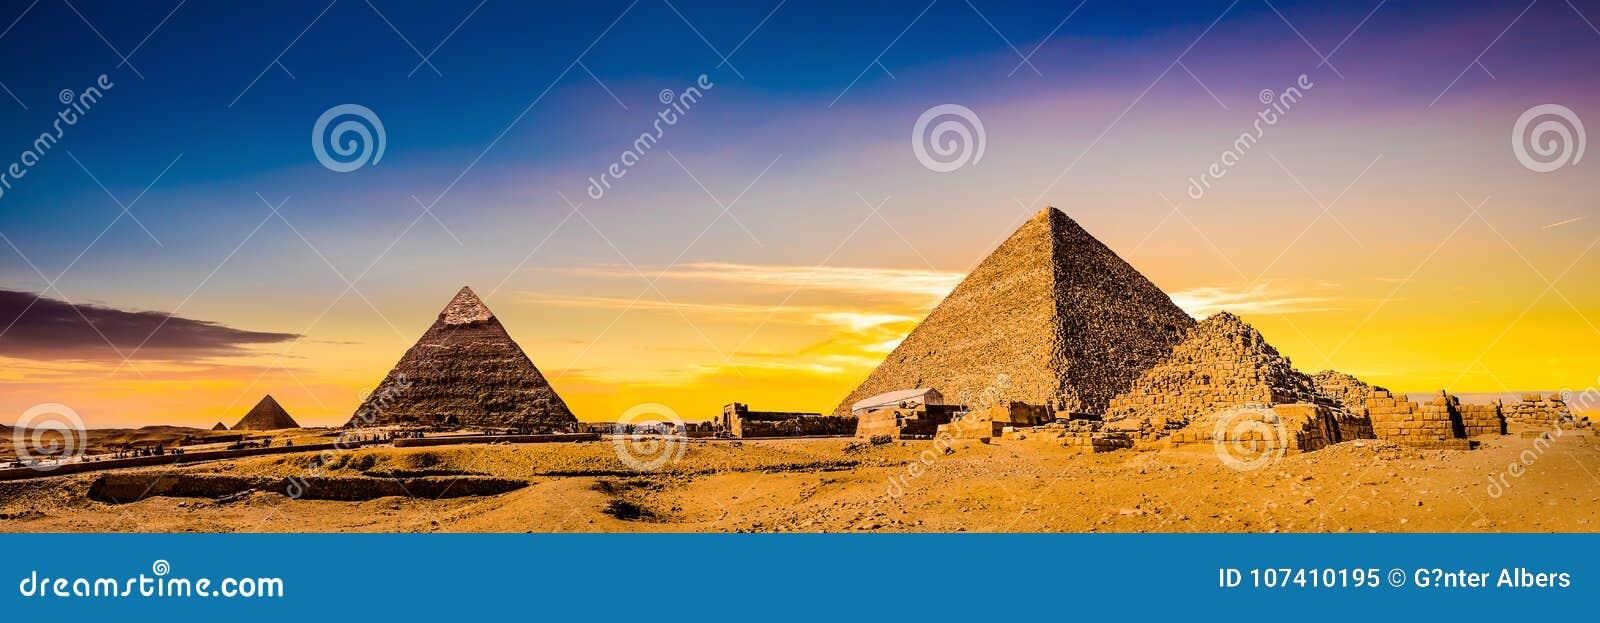 Great Pyramids of Giza